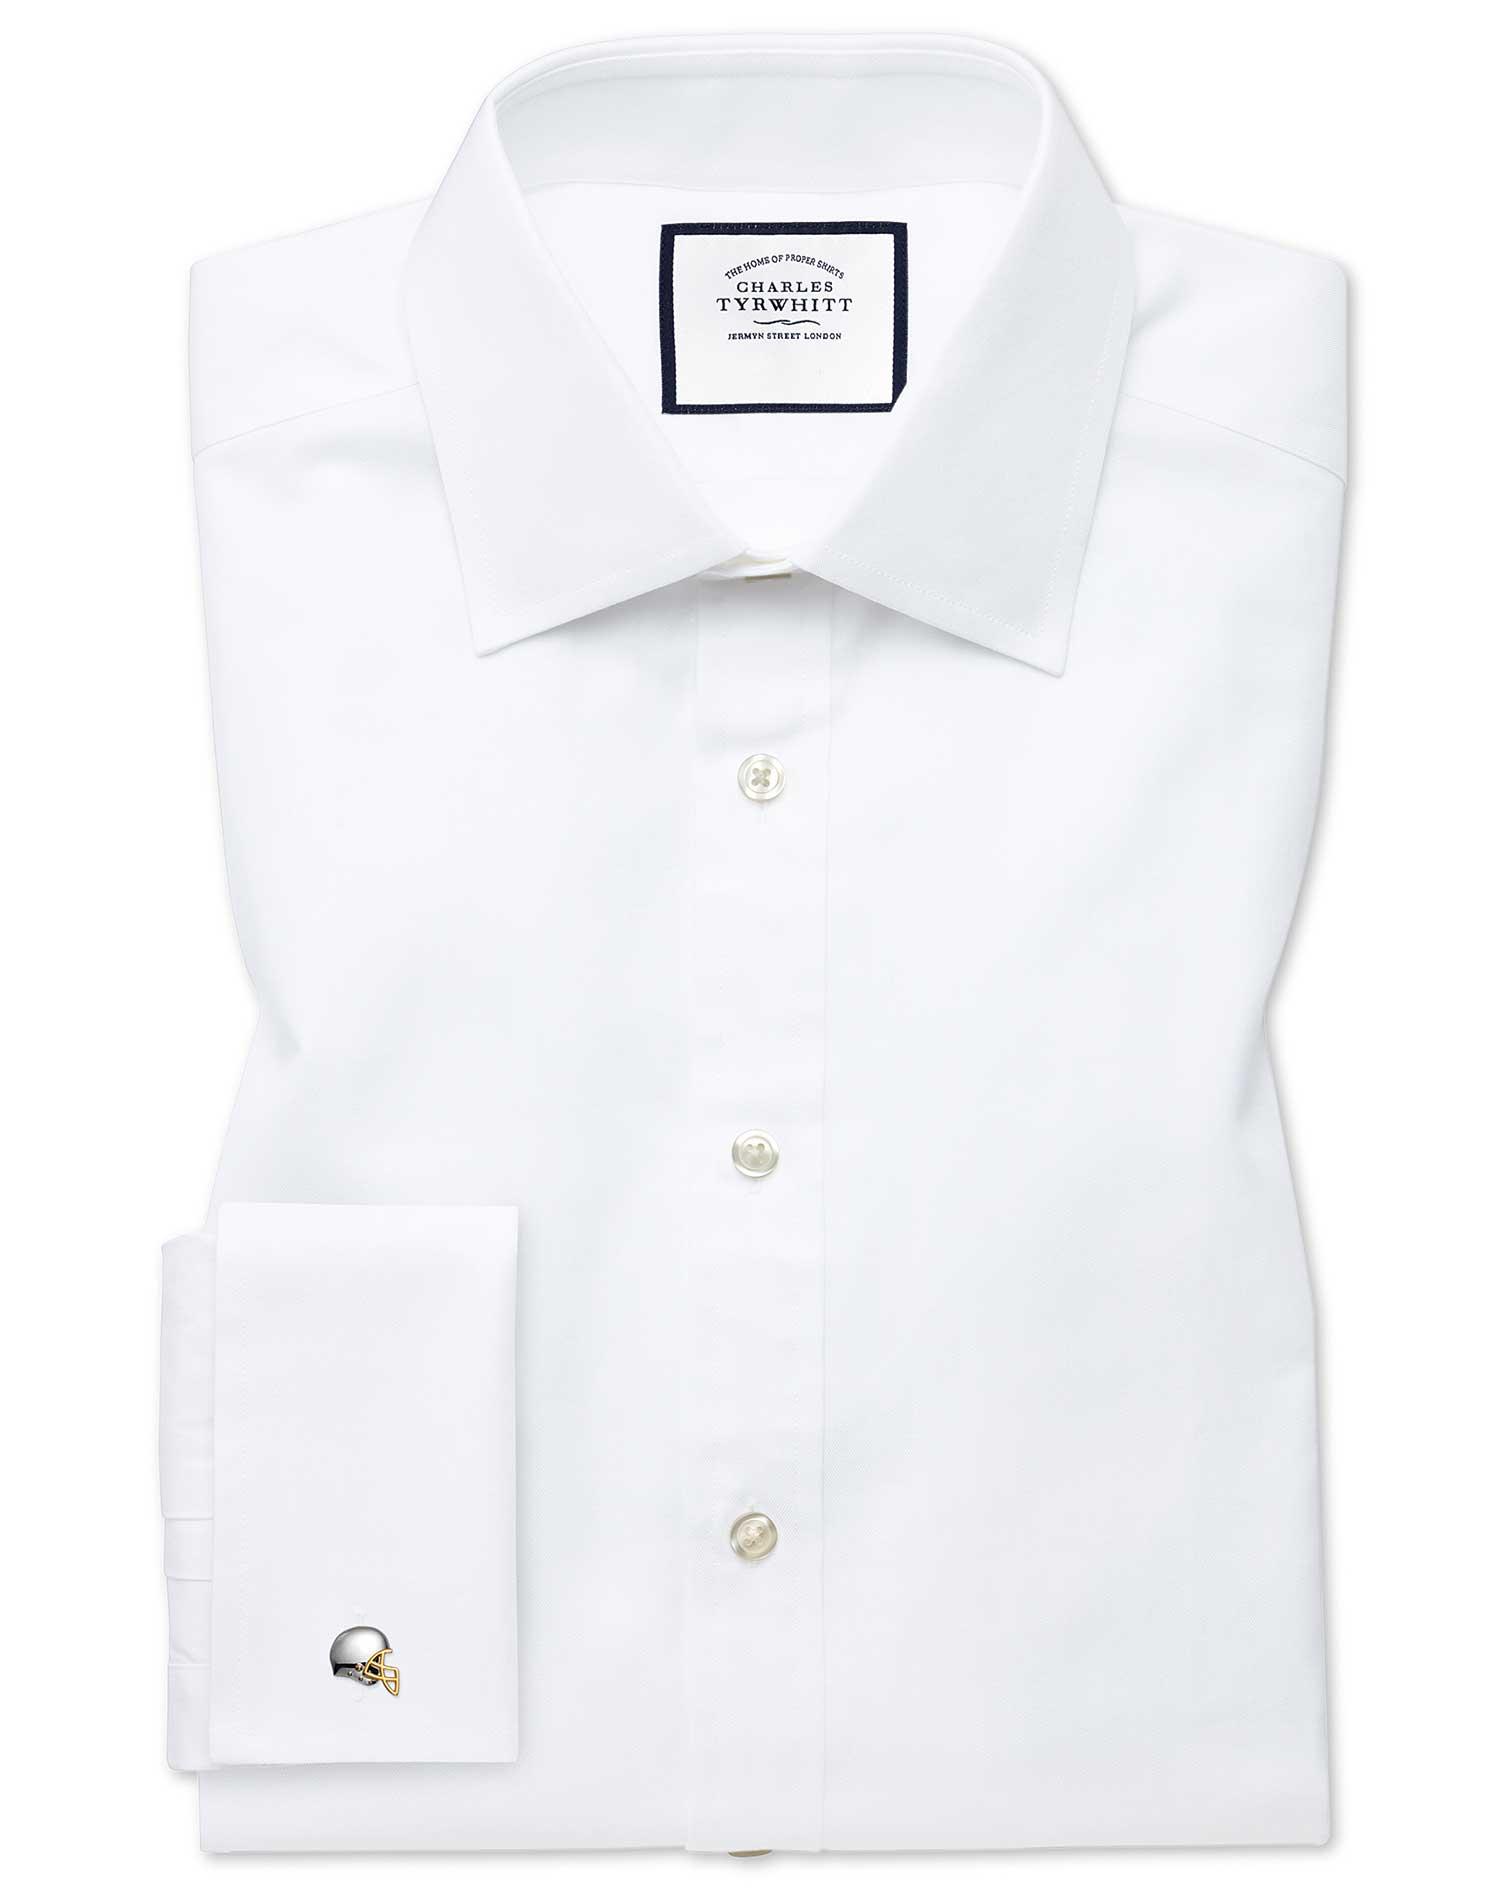 Extra Slim Fit White Fine Herringbone Cotton Formal Shirt Single Cuff Size 15.5/37 by Charles Tyrwhi